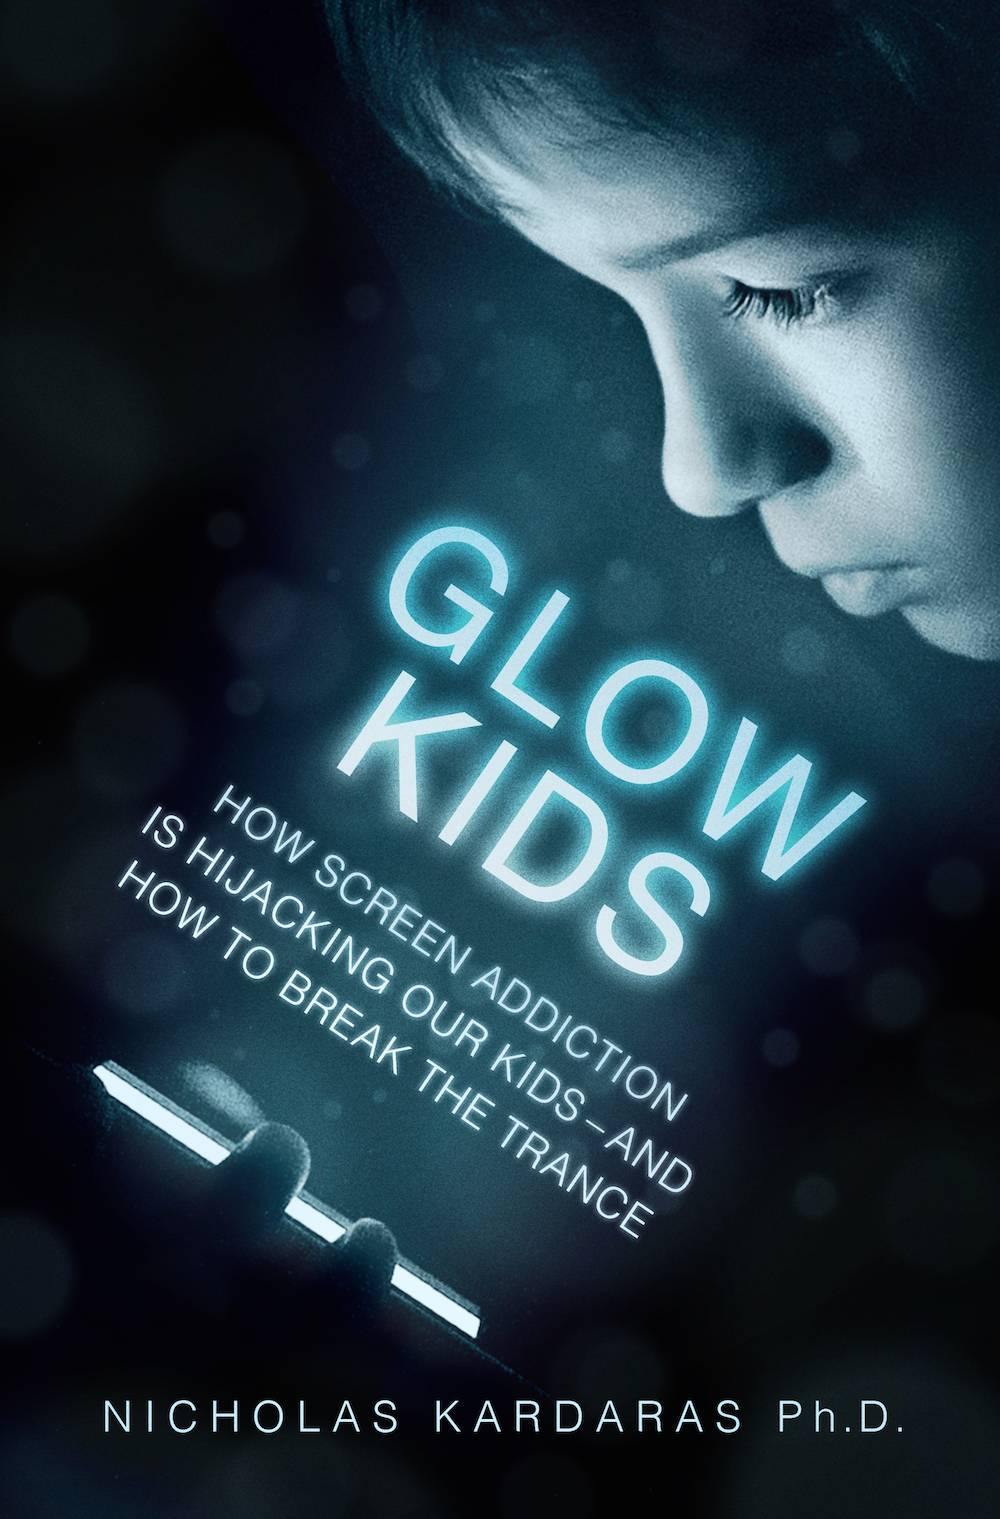 Glow Kids cover image copy.jpg